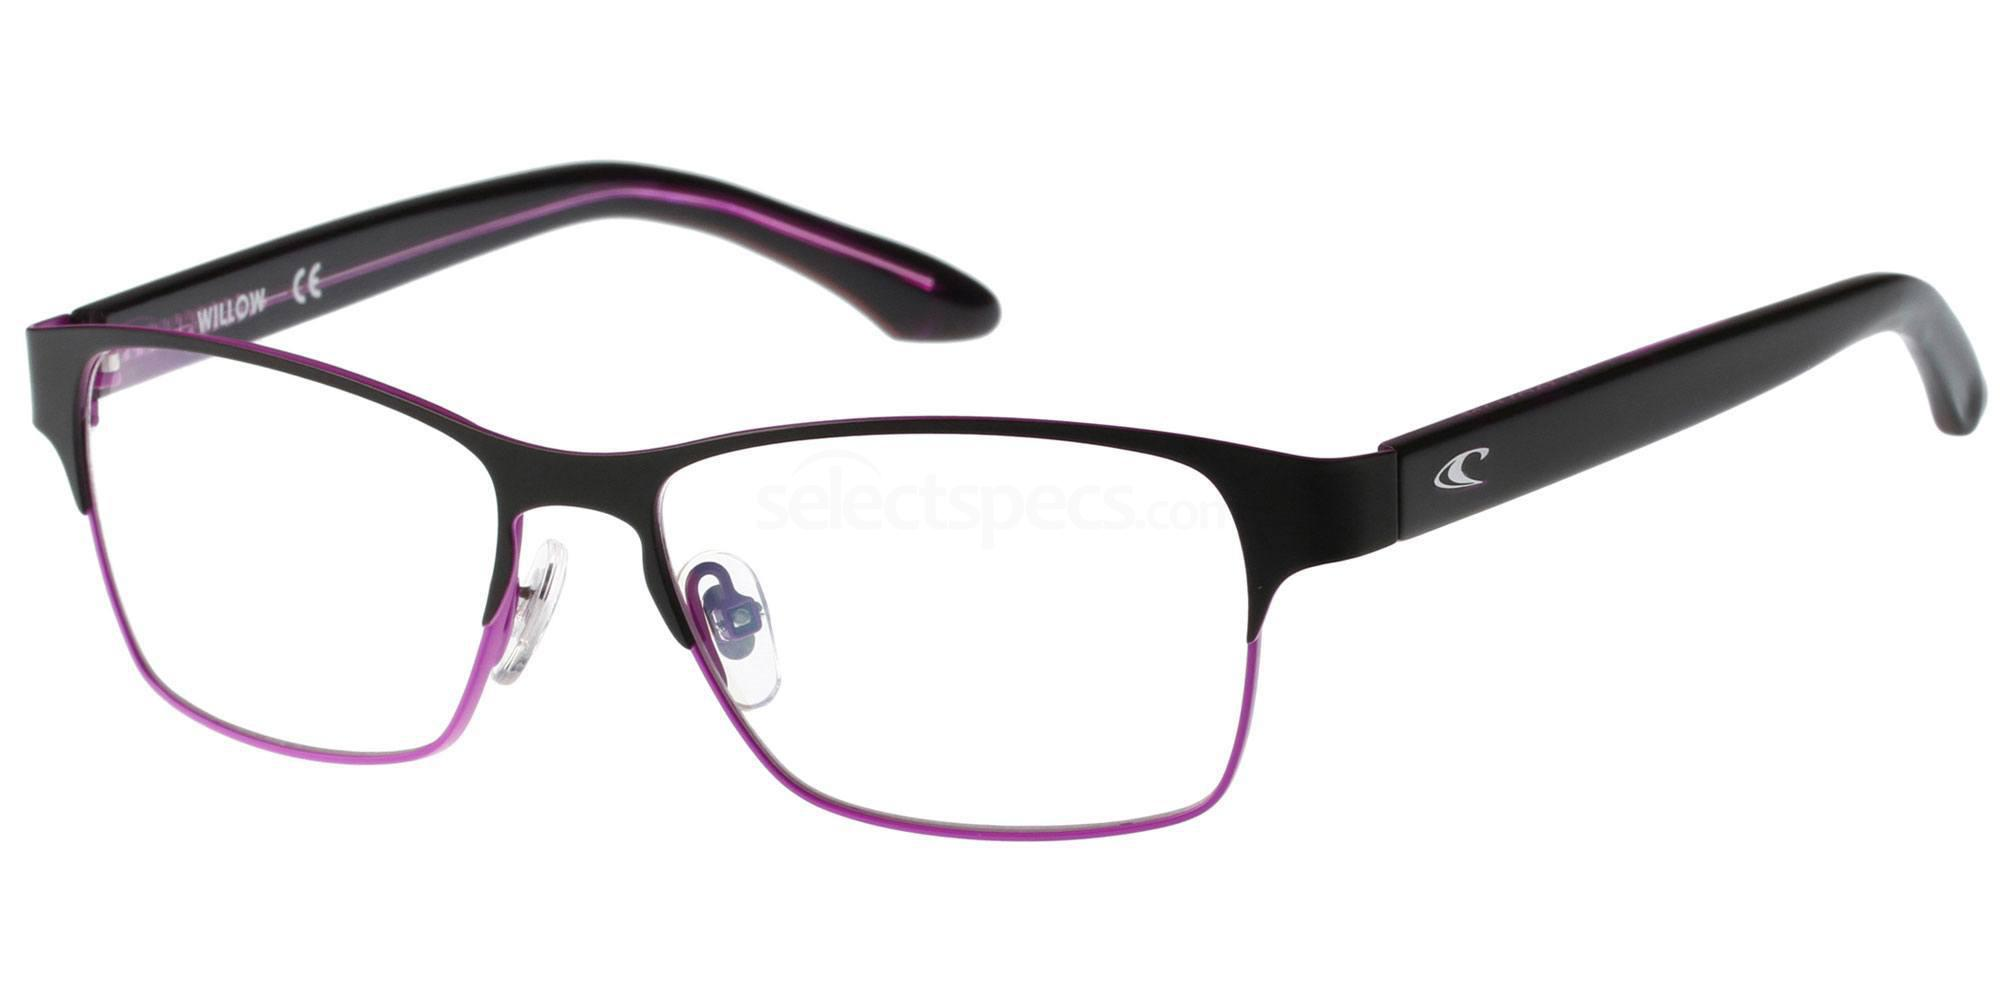 004 ONO-WILLOW Glasses, O'Neill